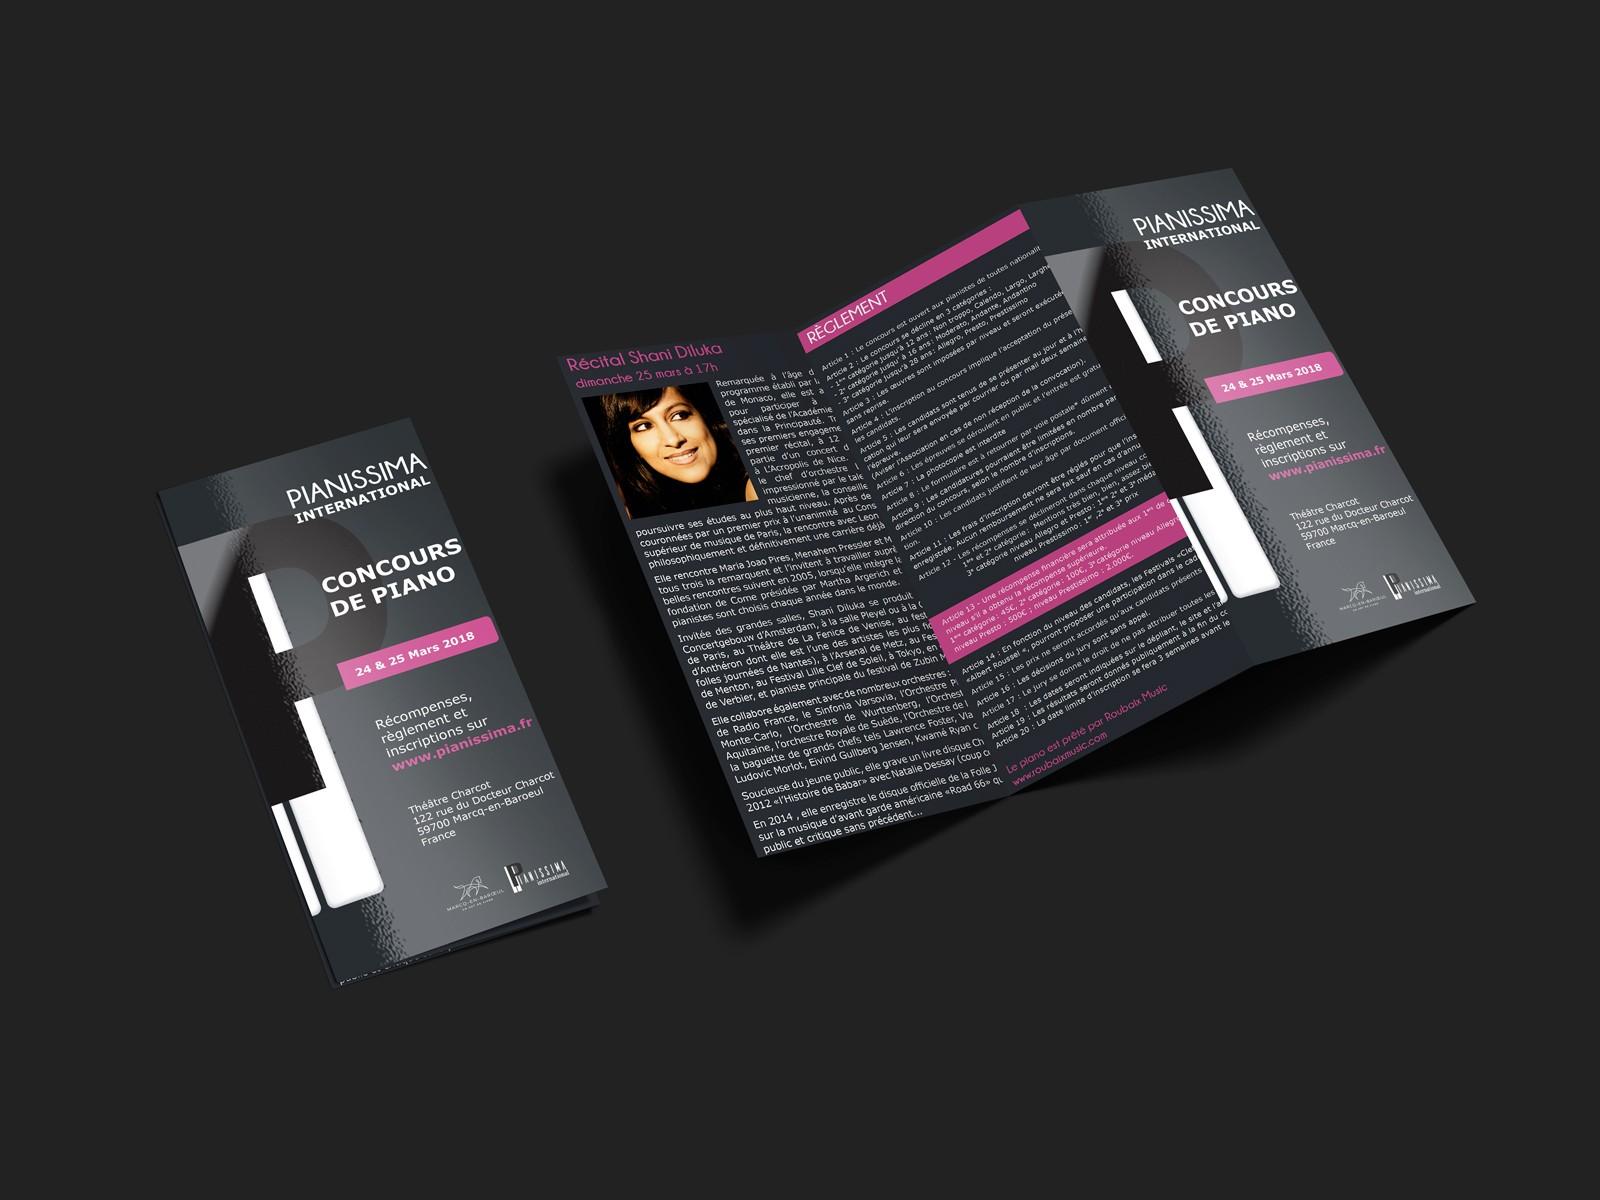 Plaquette du concours Pianissima International 2018